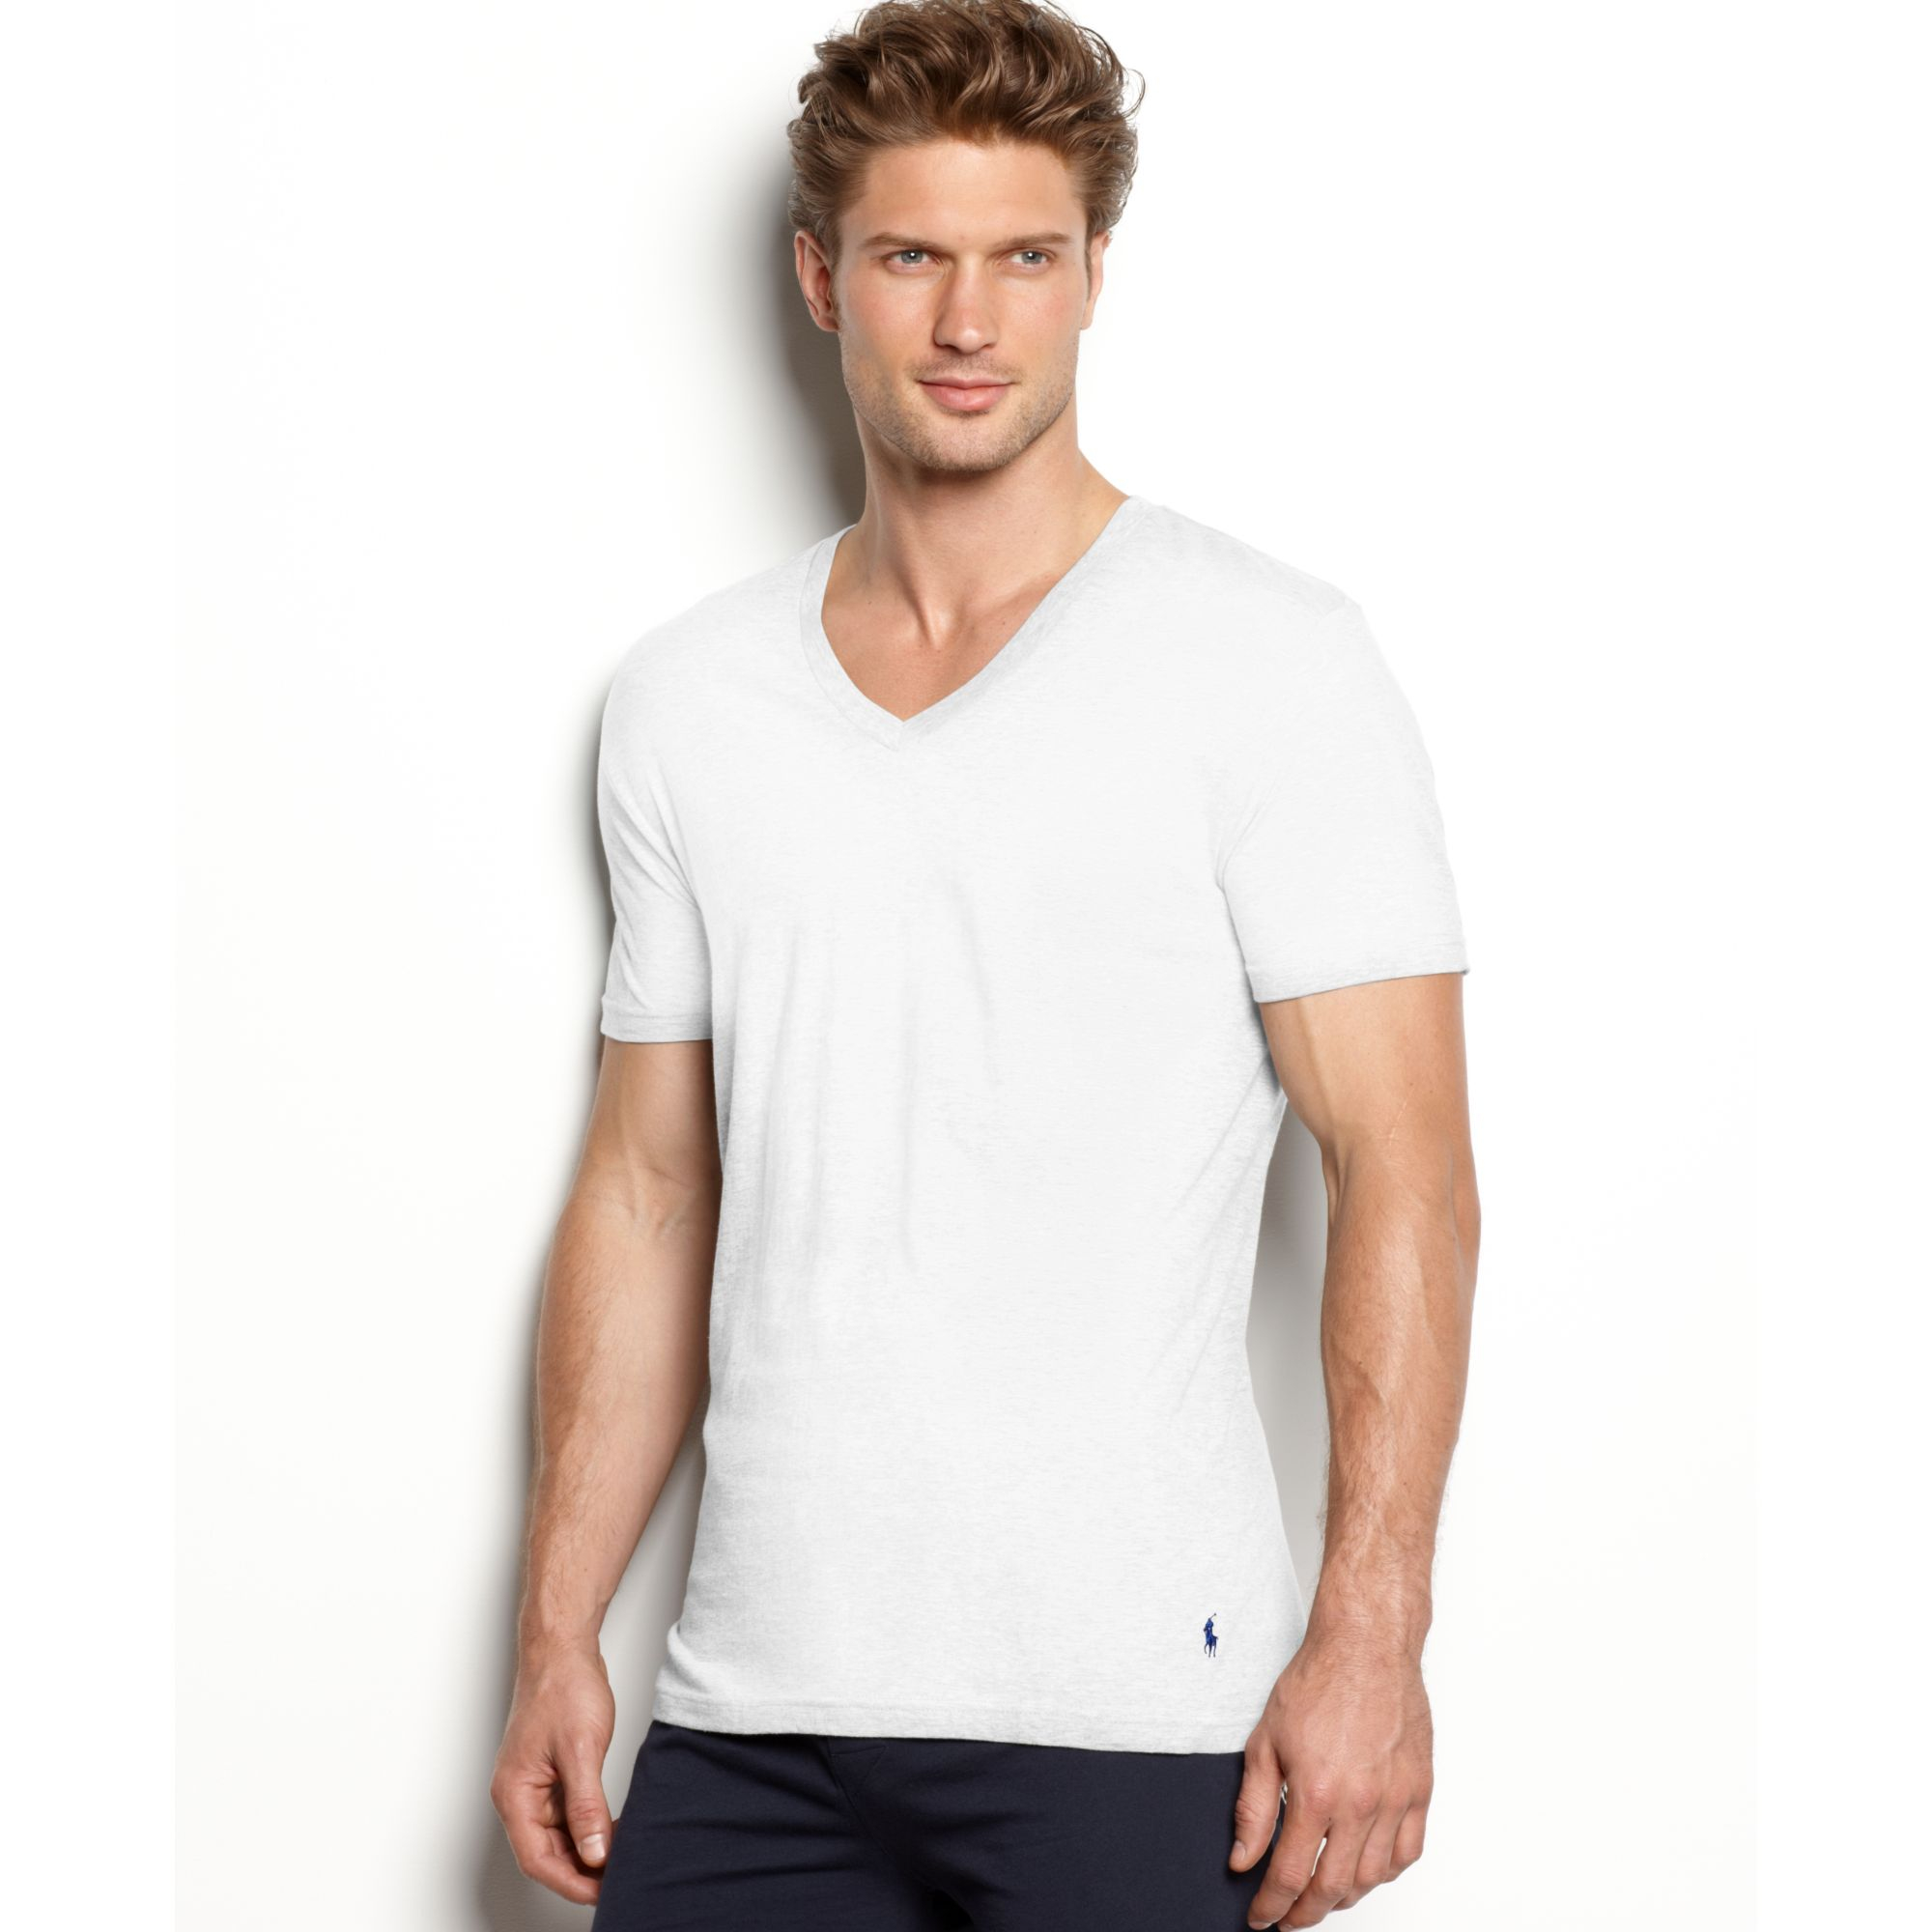 ff0b74a65adb Ralph Lauren Slim Fit Stretch V Neck T Shirt 2 Pack in White for Men ...